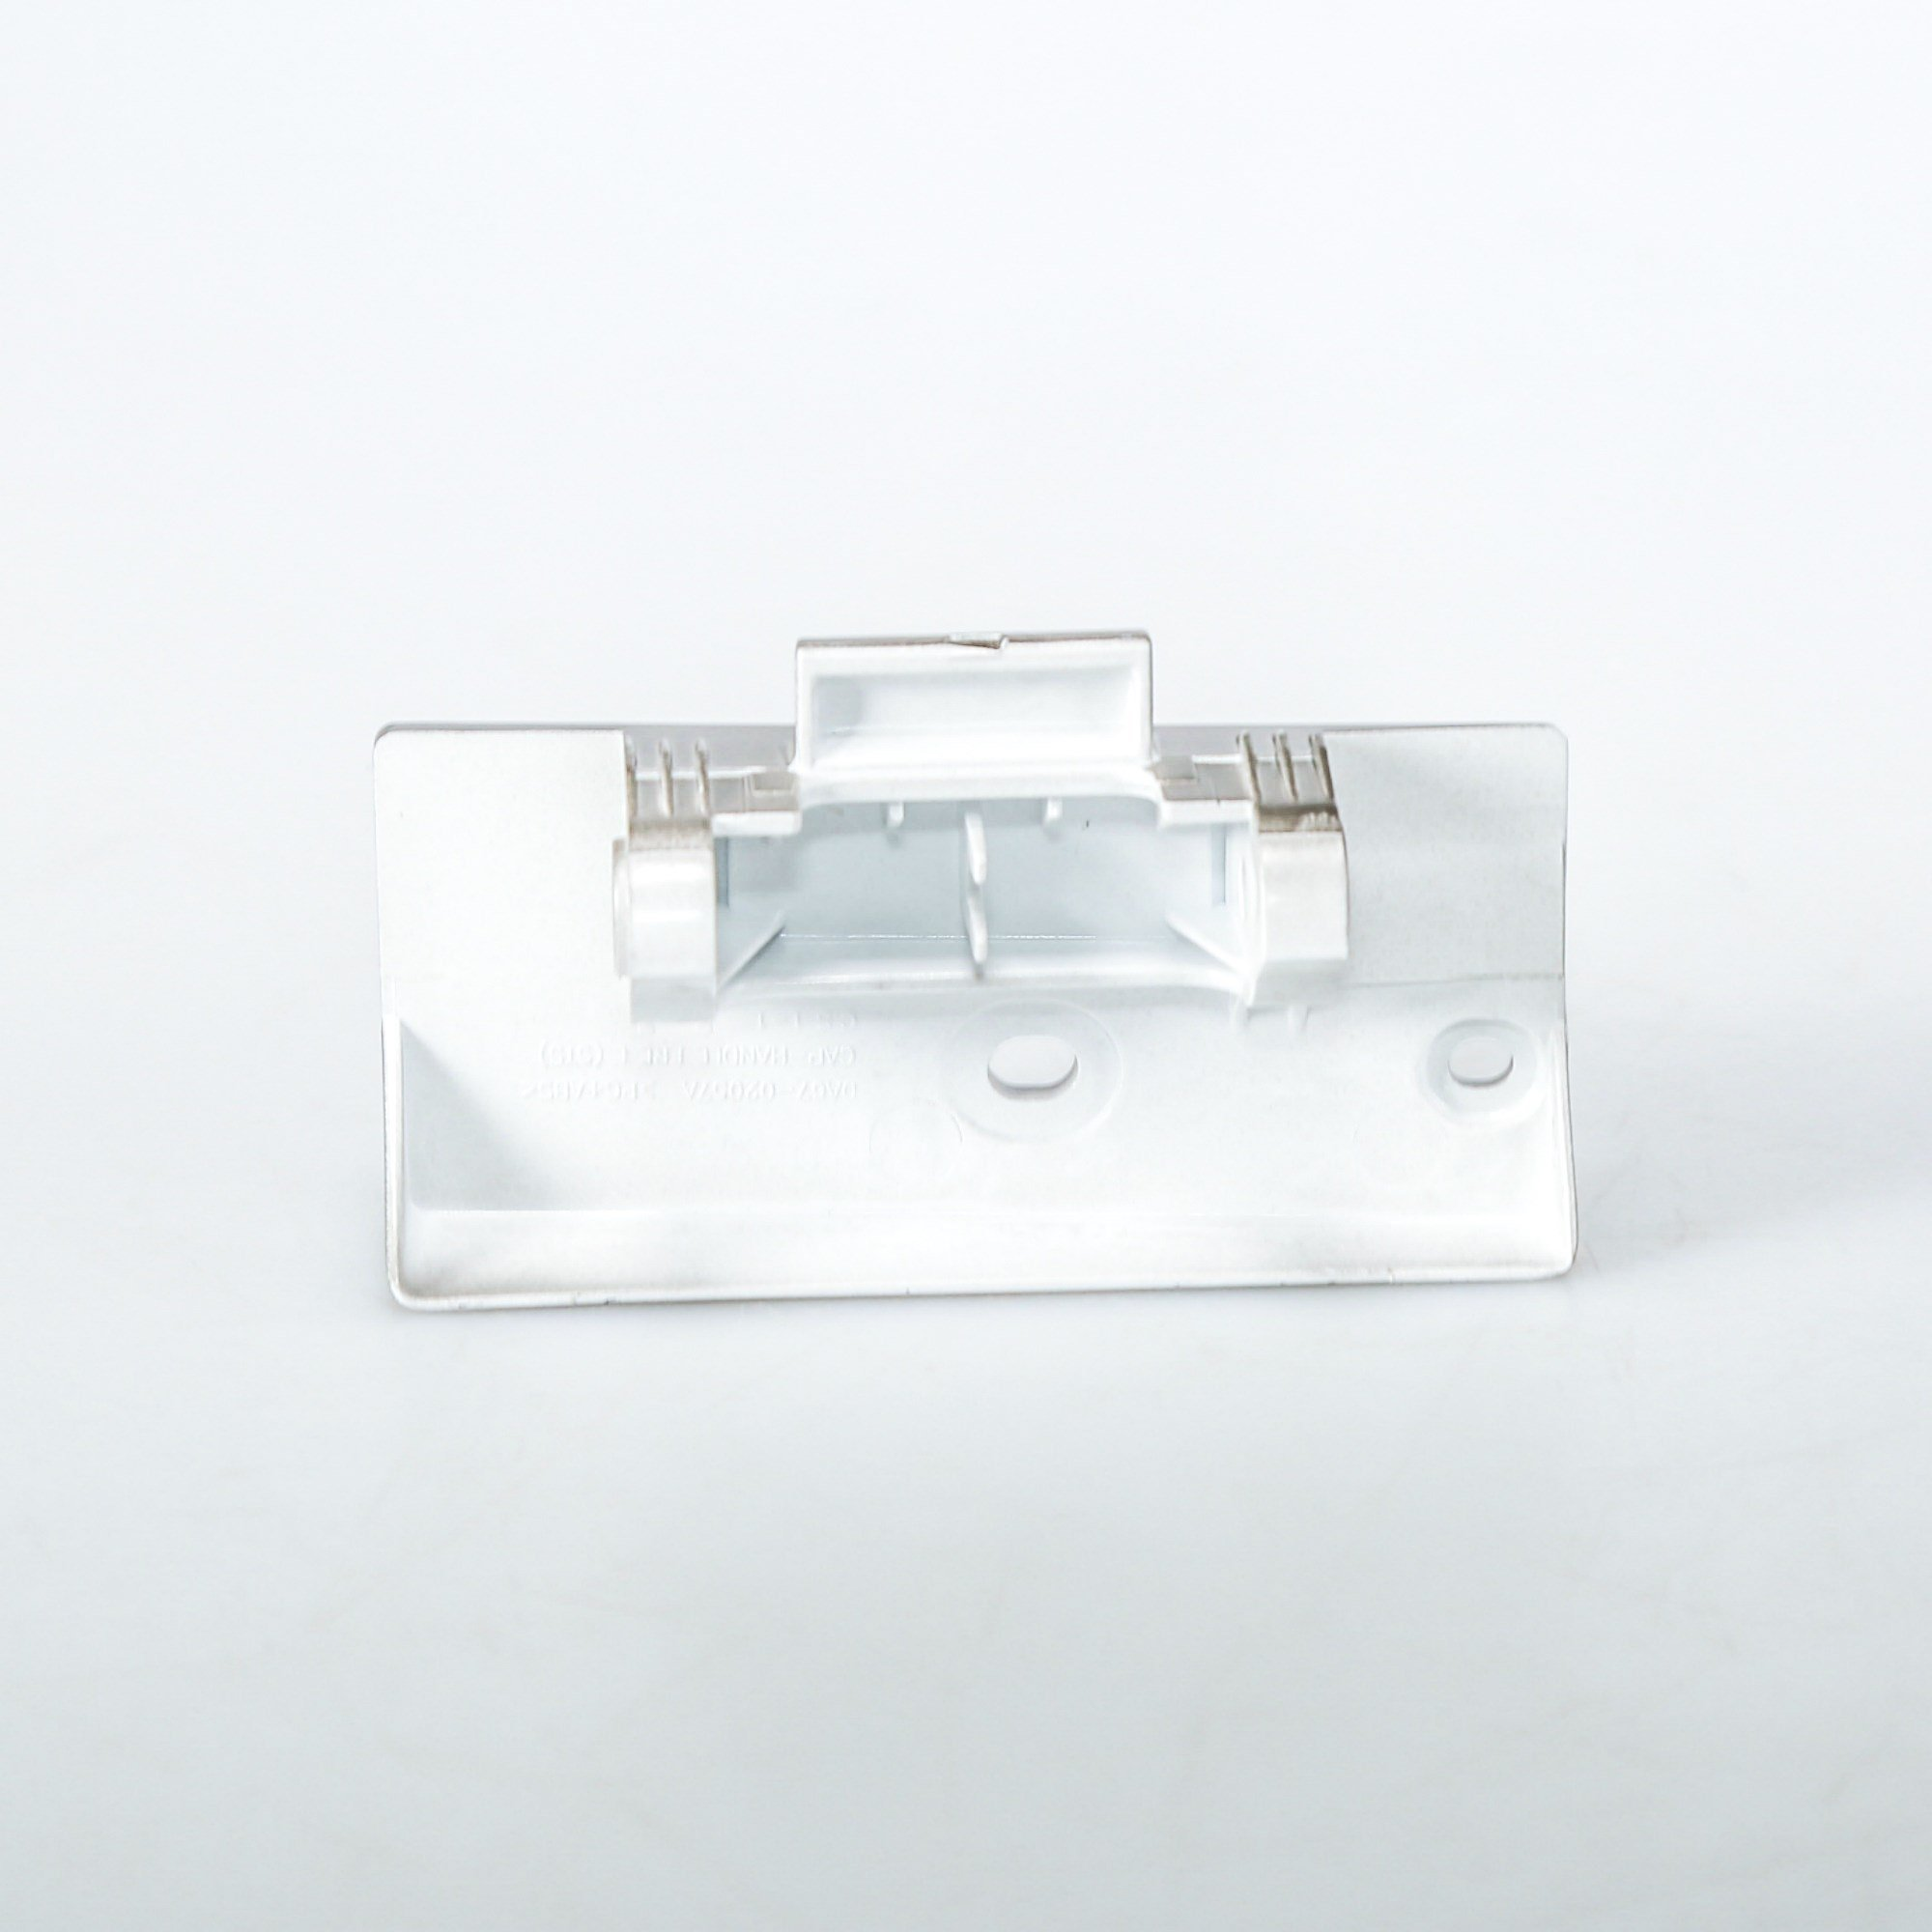 Samsung DA67-02057A Cap-Handle Fre L